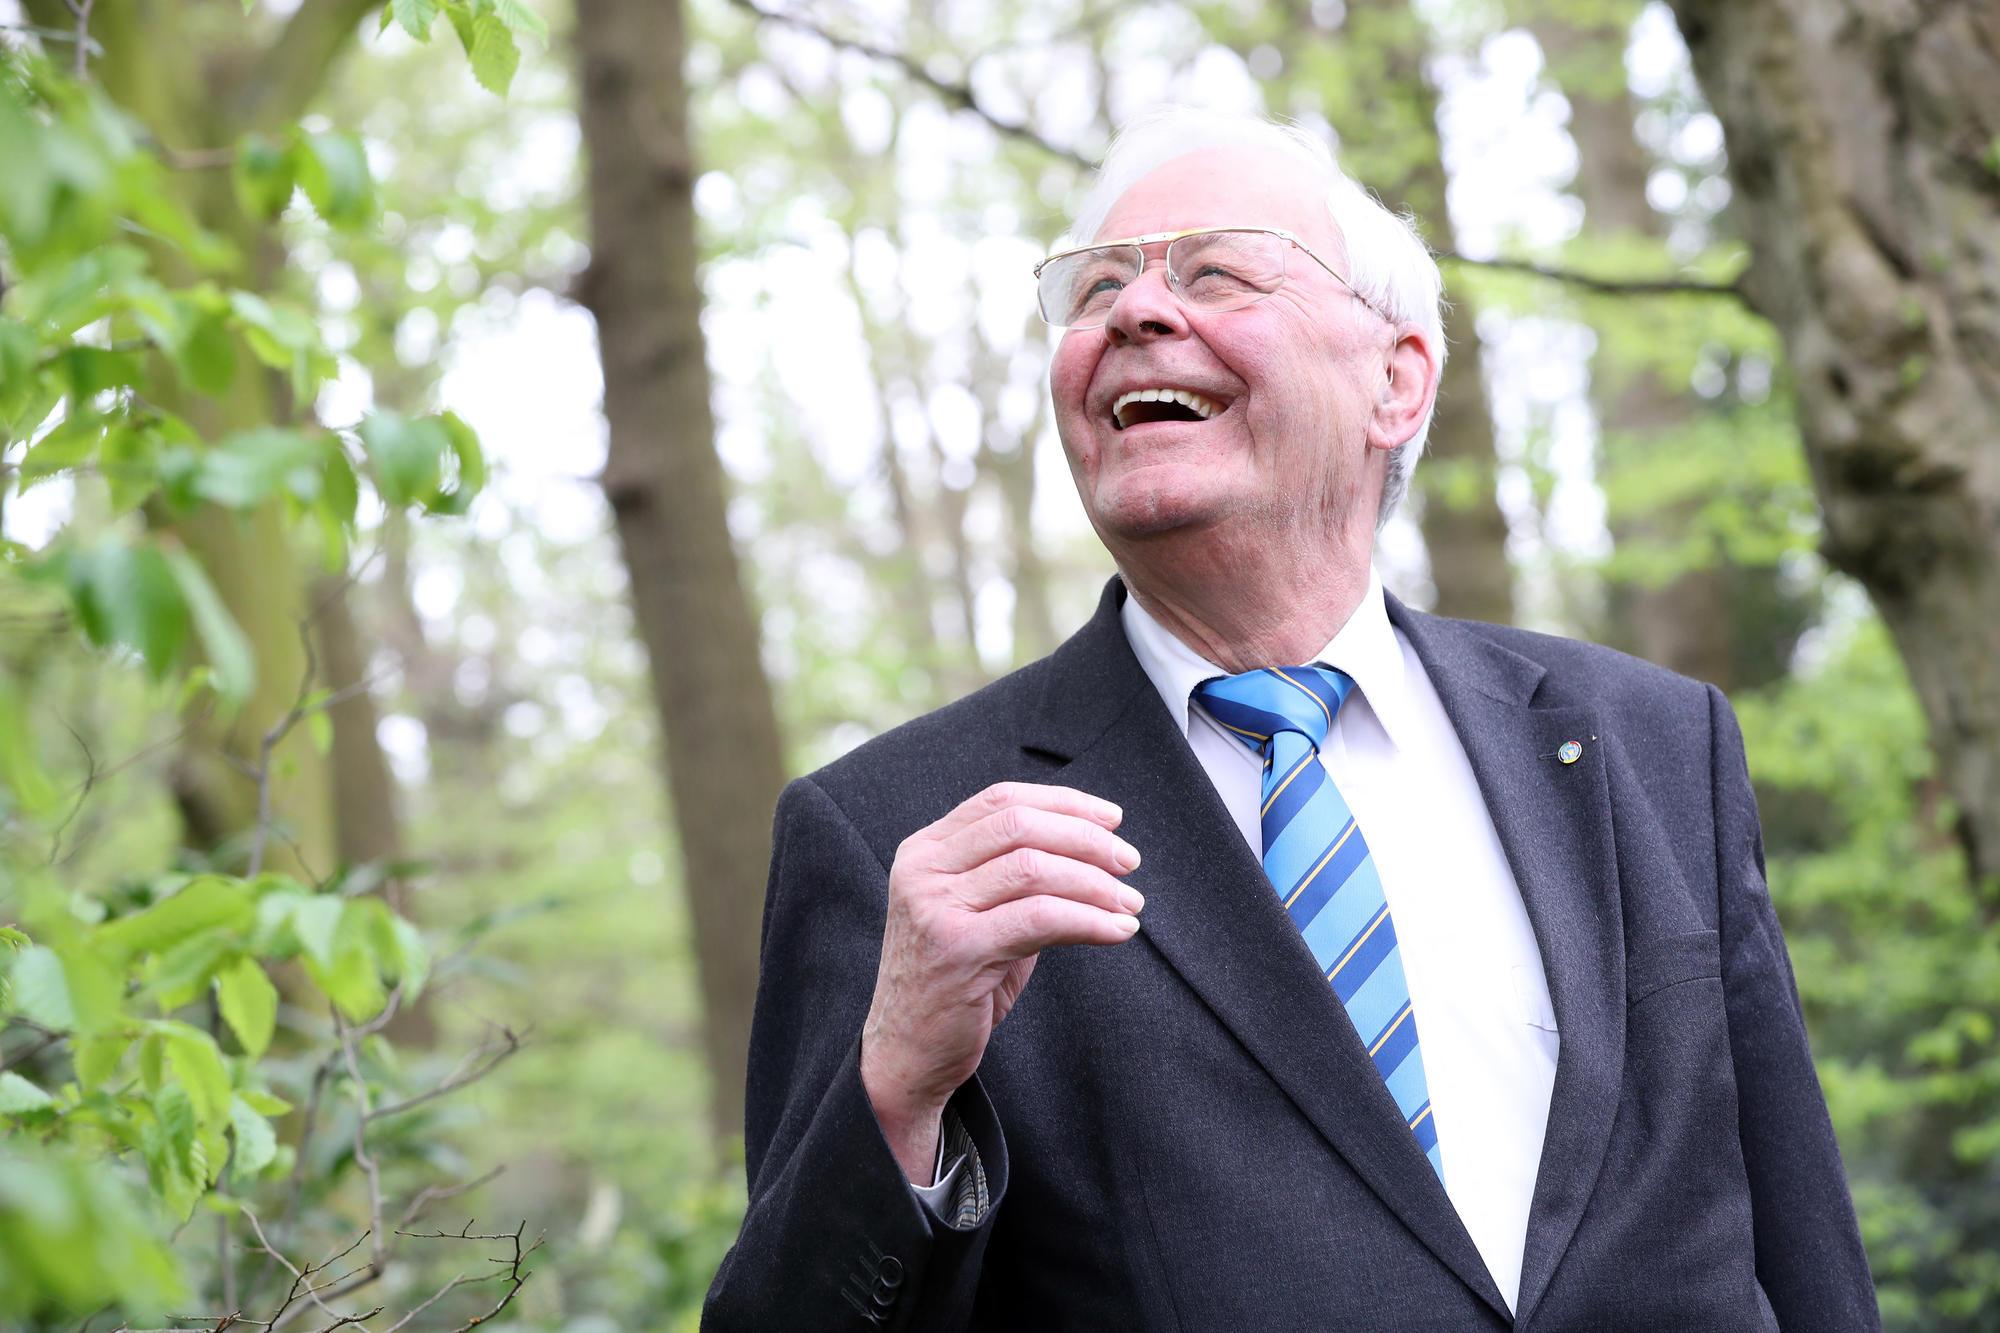 Paul De Broe, afscheidsnemend voorzitter Blindenzorg Licht en Liefde © Kristof Ghyselinck